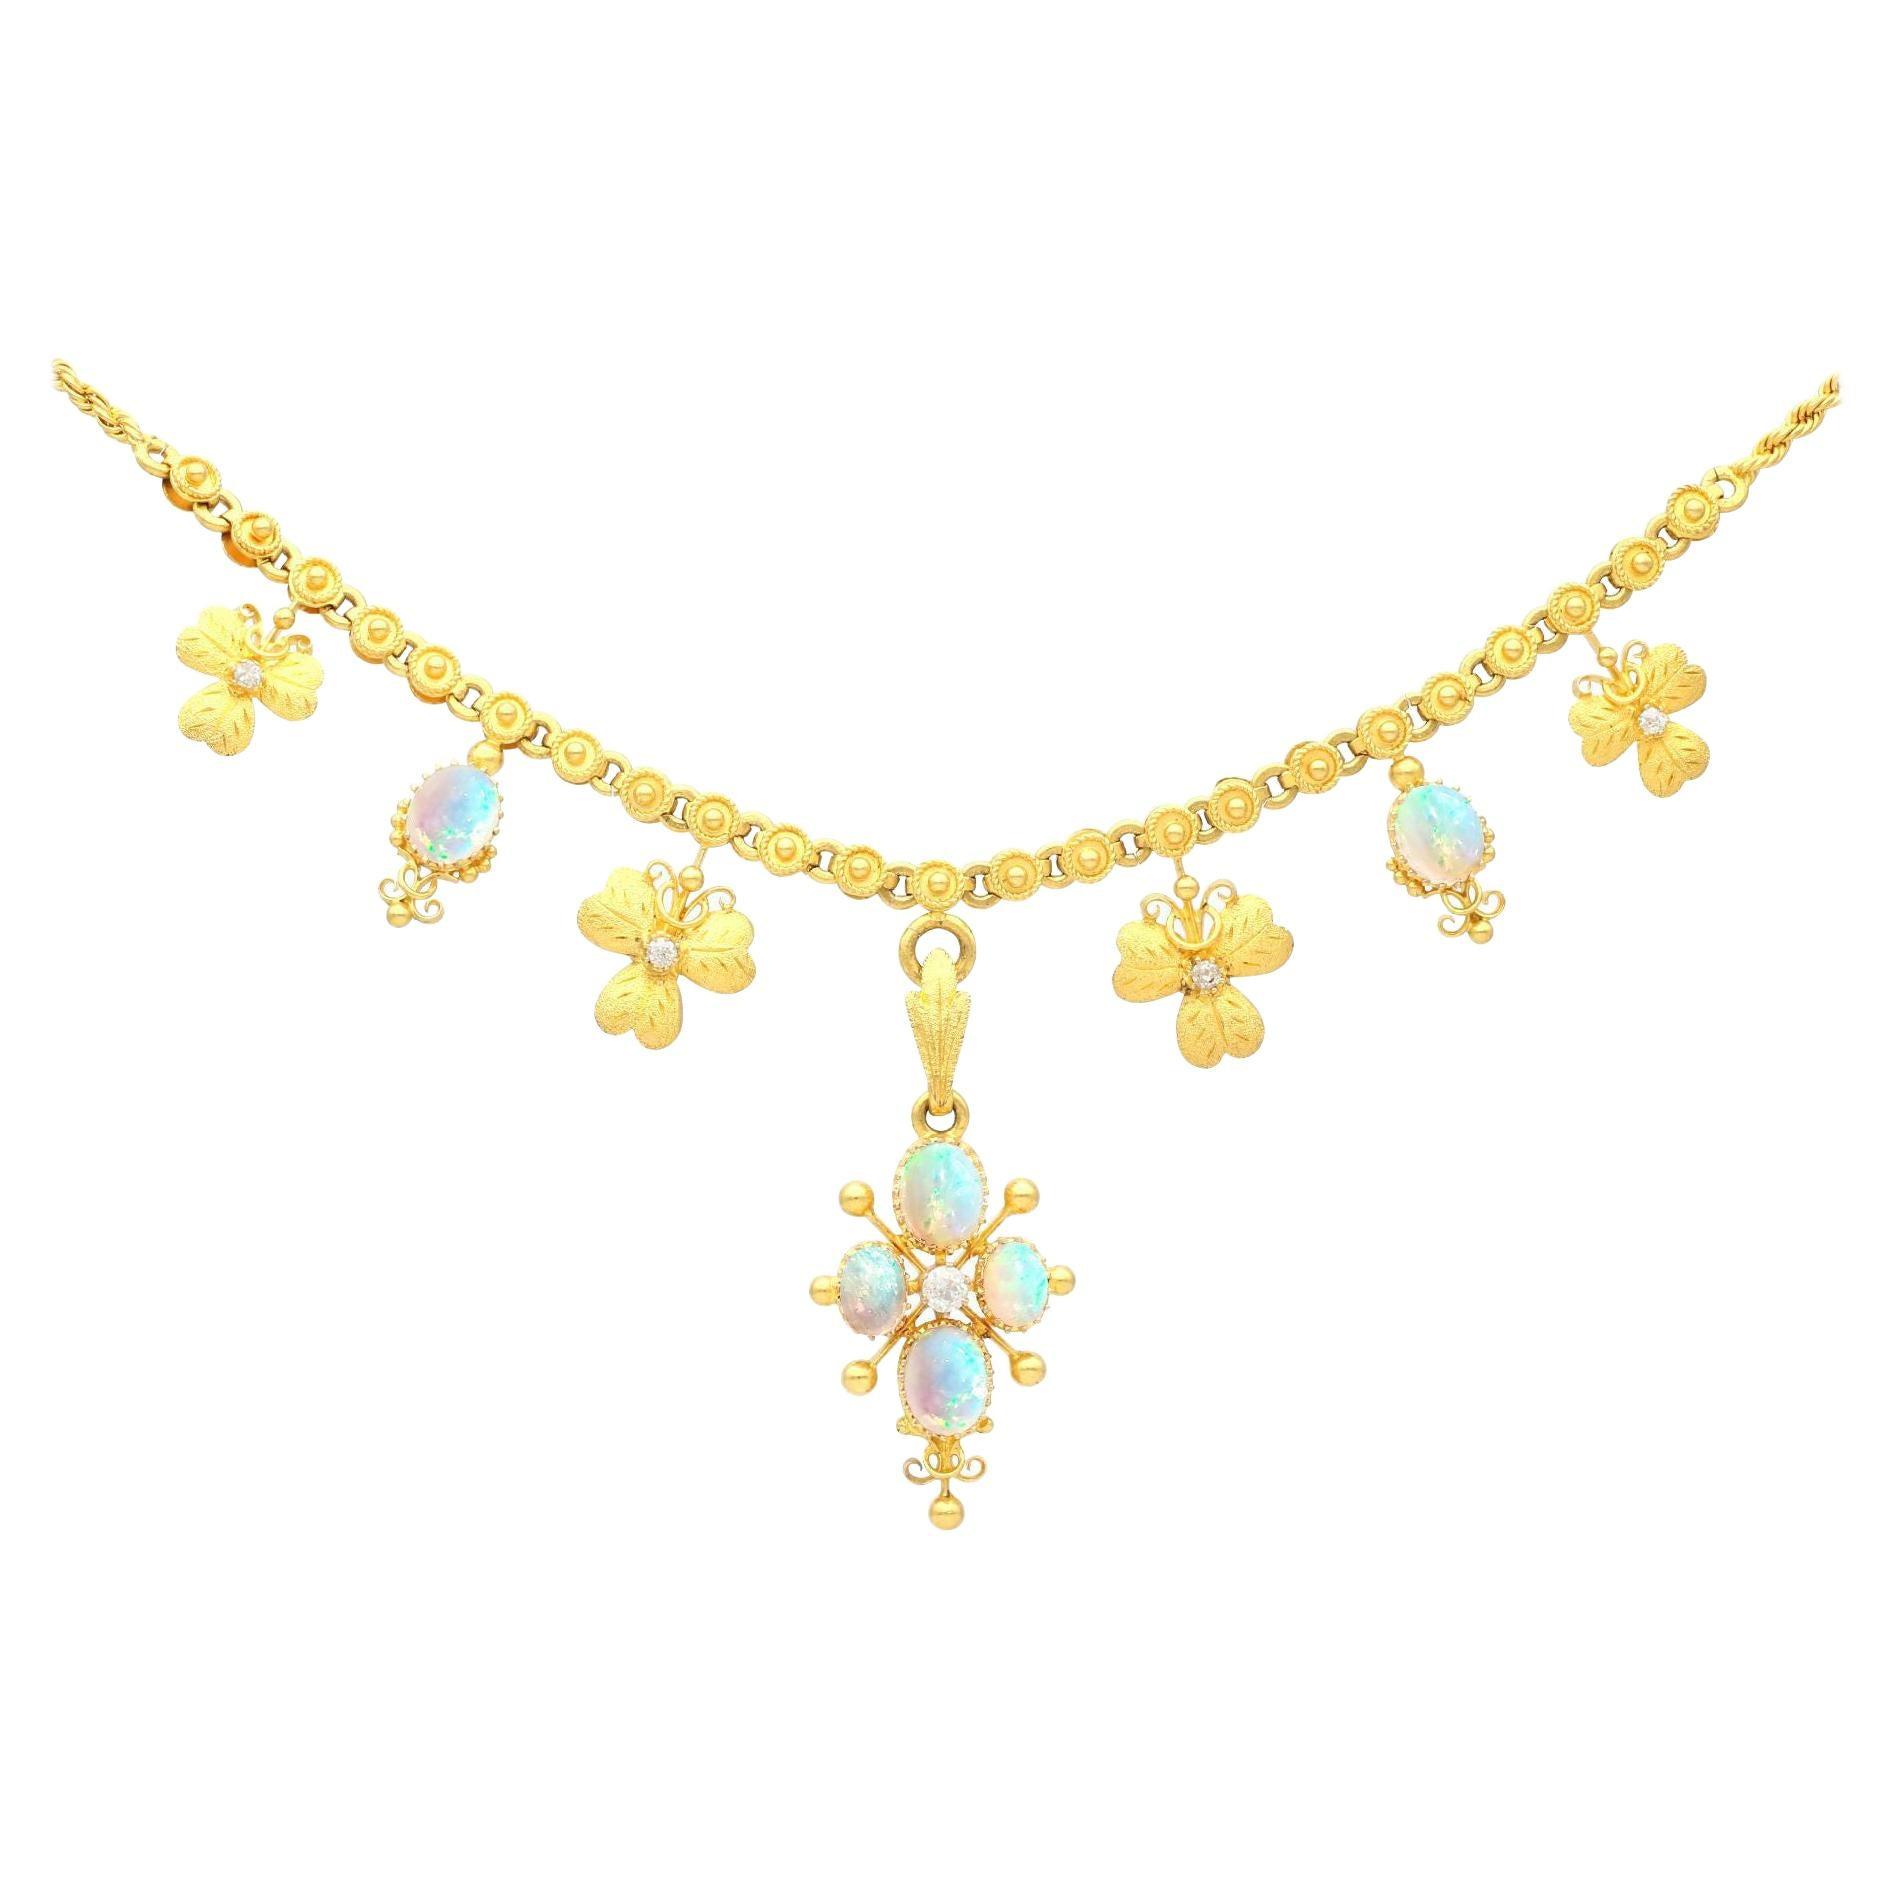 Antique 3.45 Carat Opal and Diamond 22k Yellow Gold Necklace Circa 1890